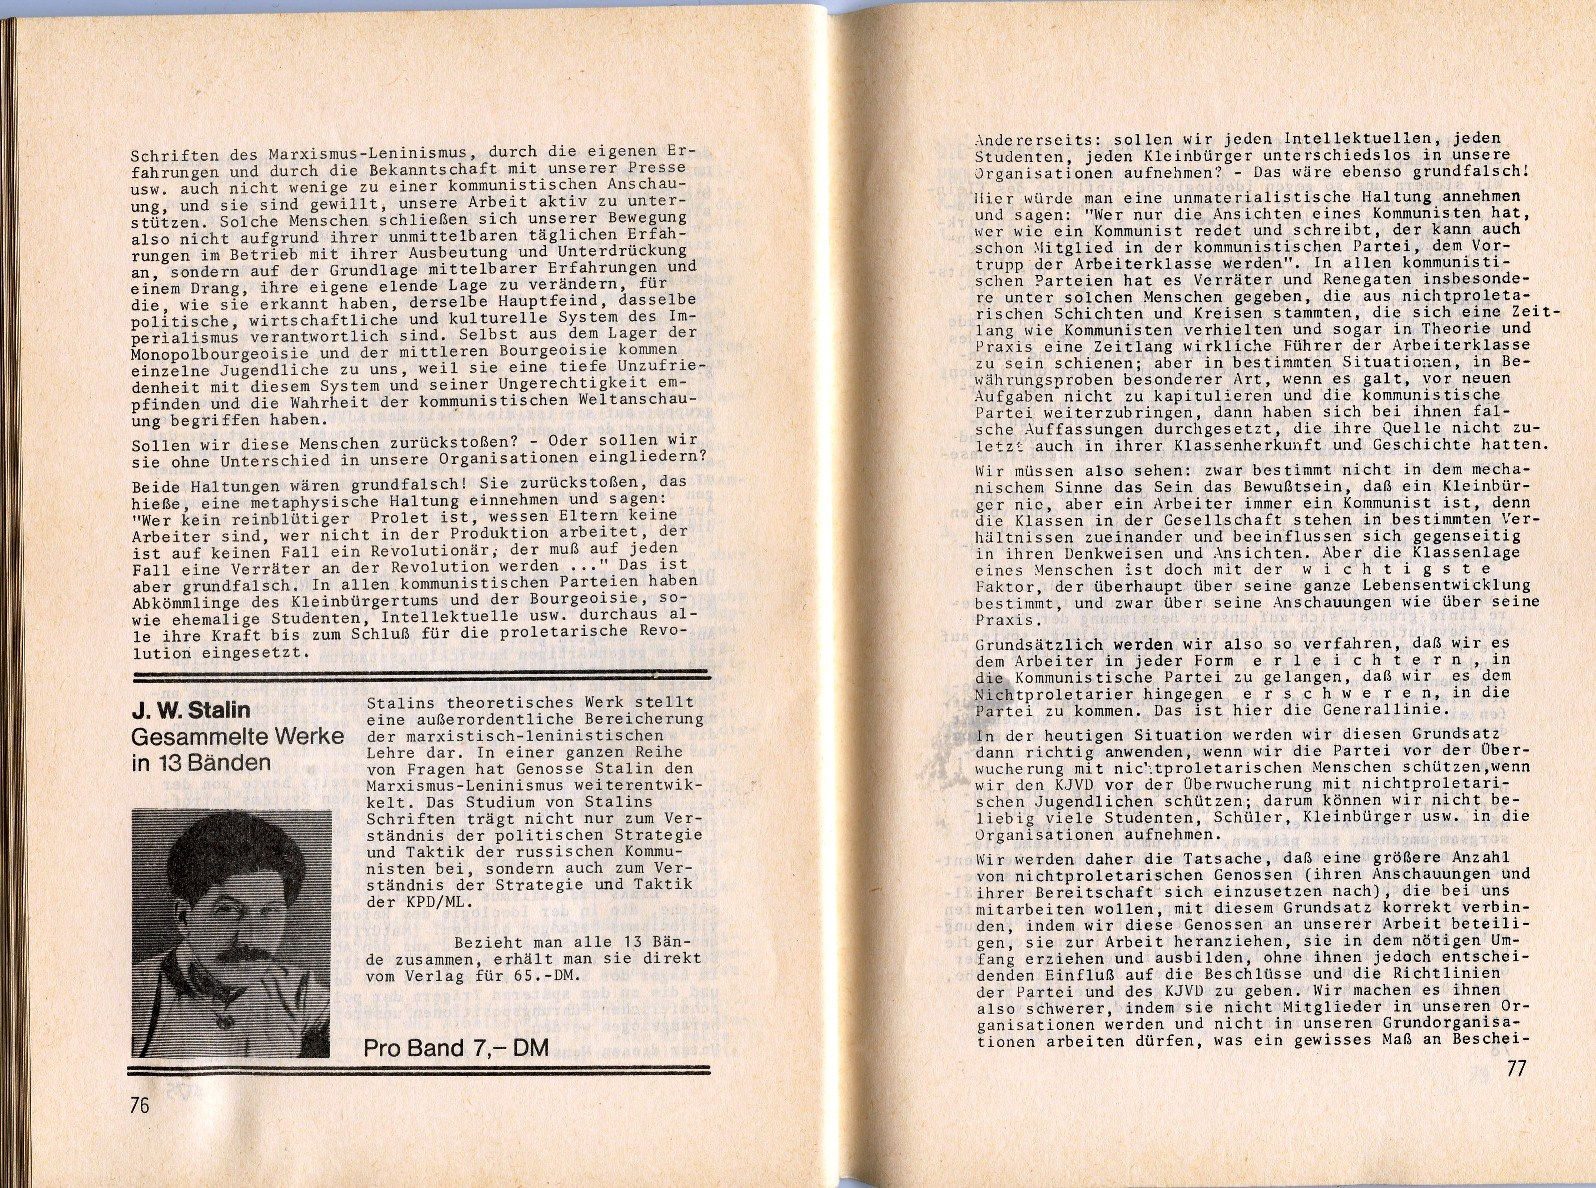 ZB_Parteiarbeiter_1971_07_40